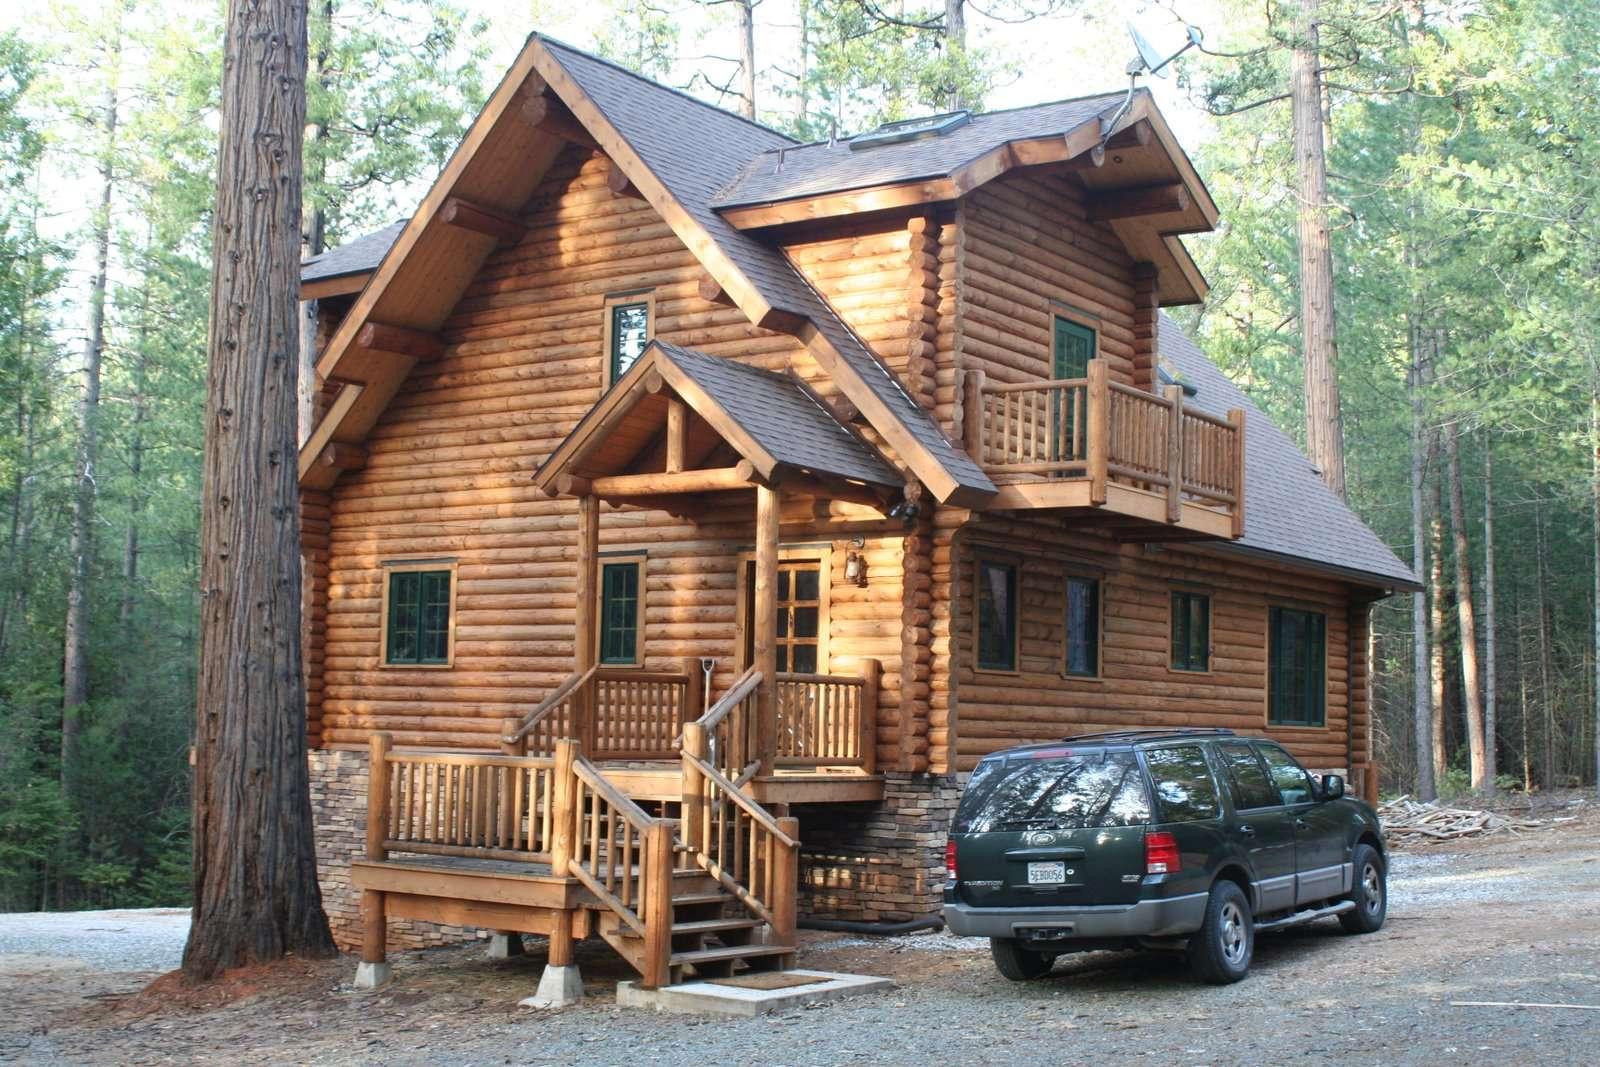 Gold creek cabin sierra nevada foothills ca 5 hipcamper for Sierra nevada cabine